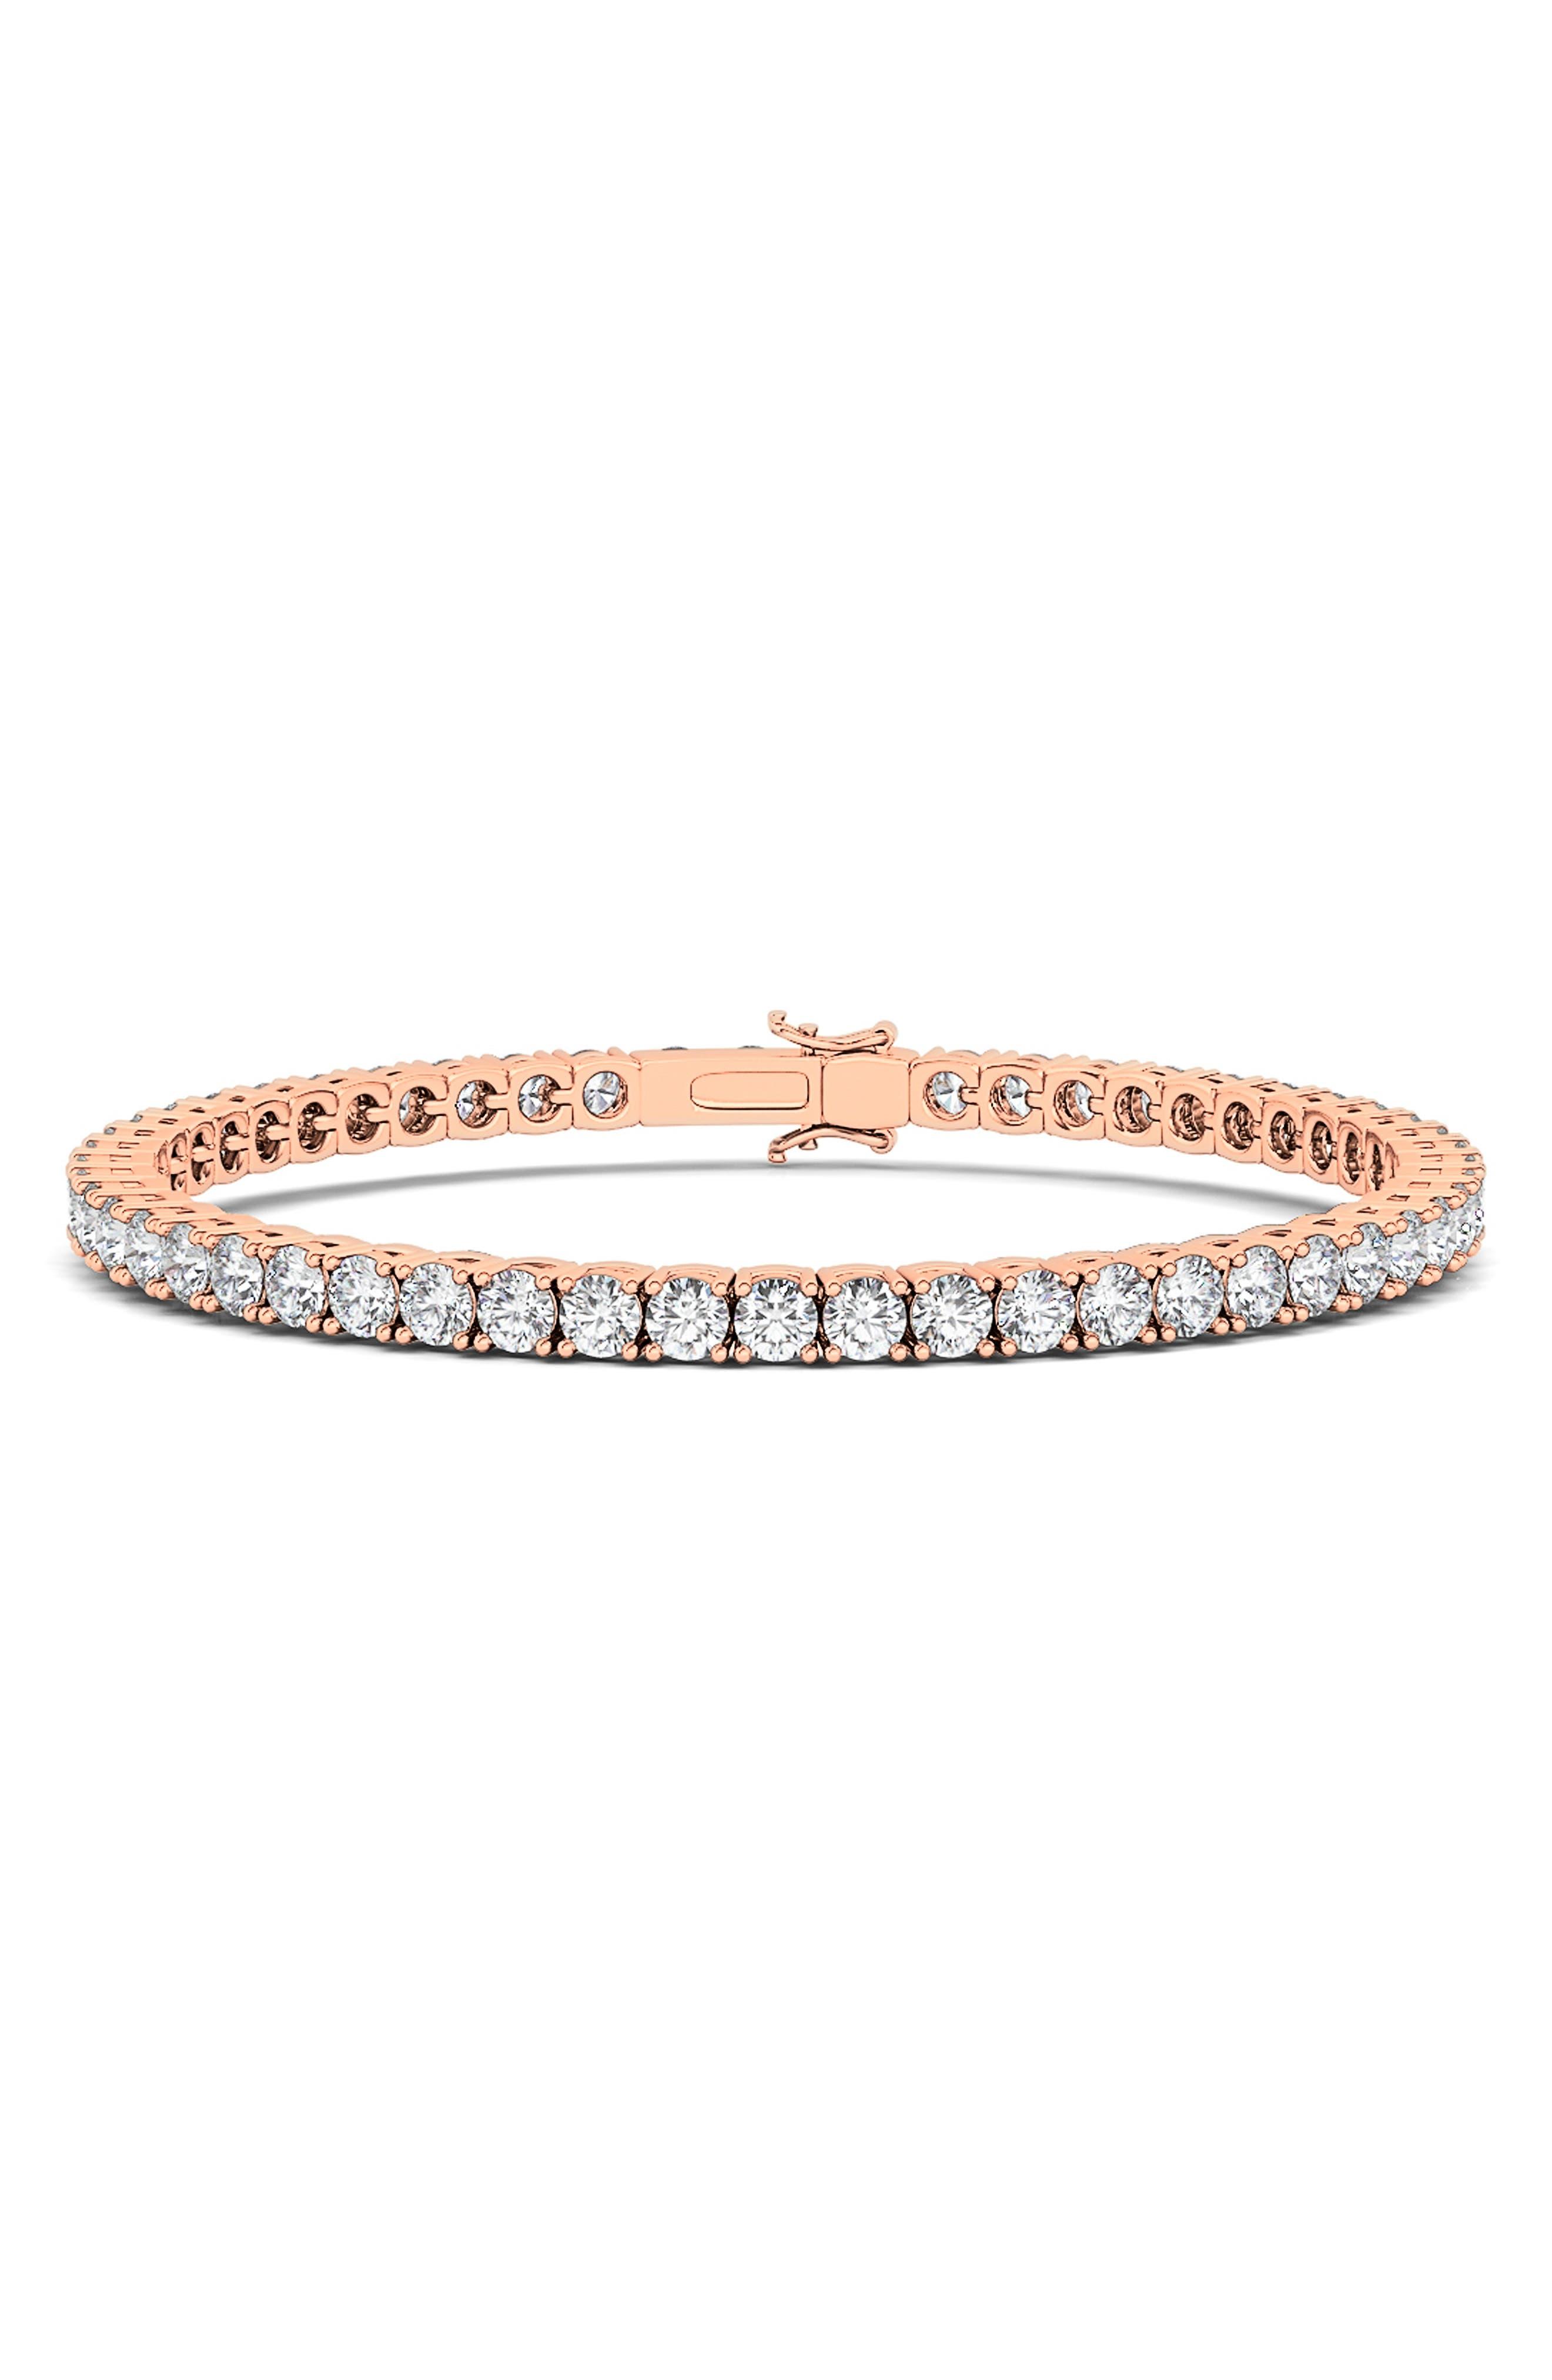 4-Prong 7Ct Lab Created Diamond 14K Gold Tennis Bracelet